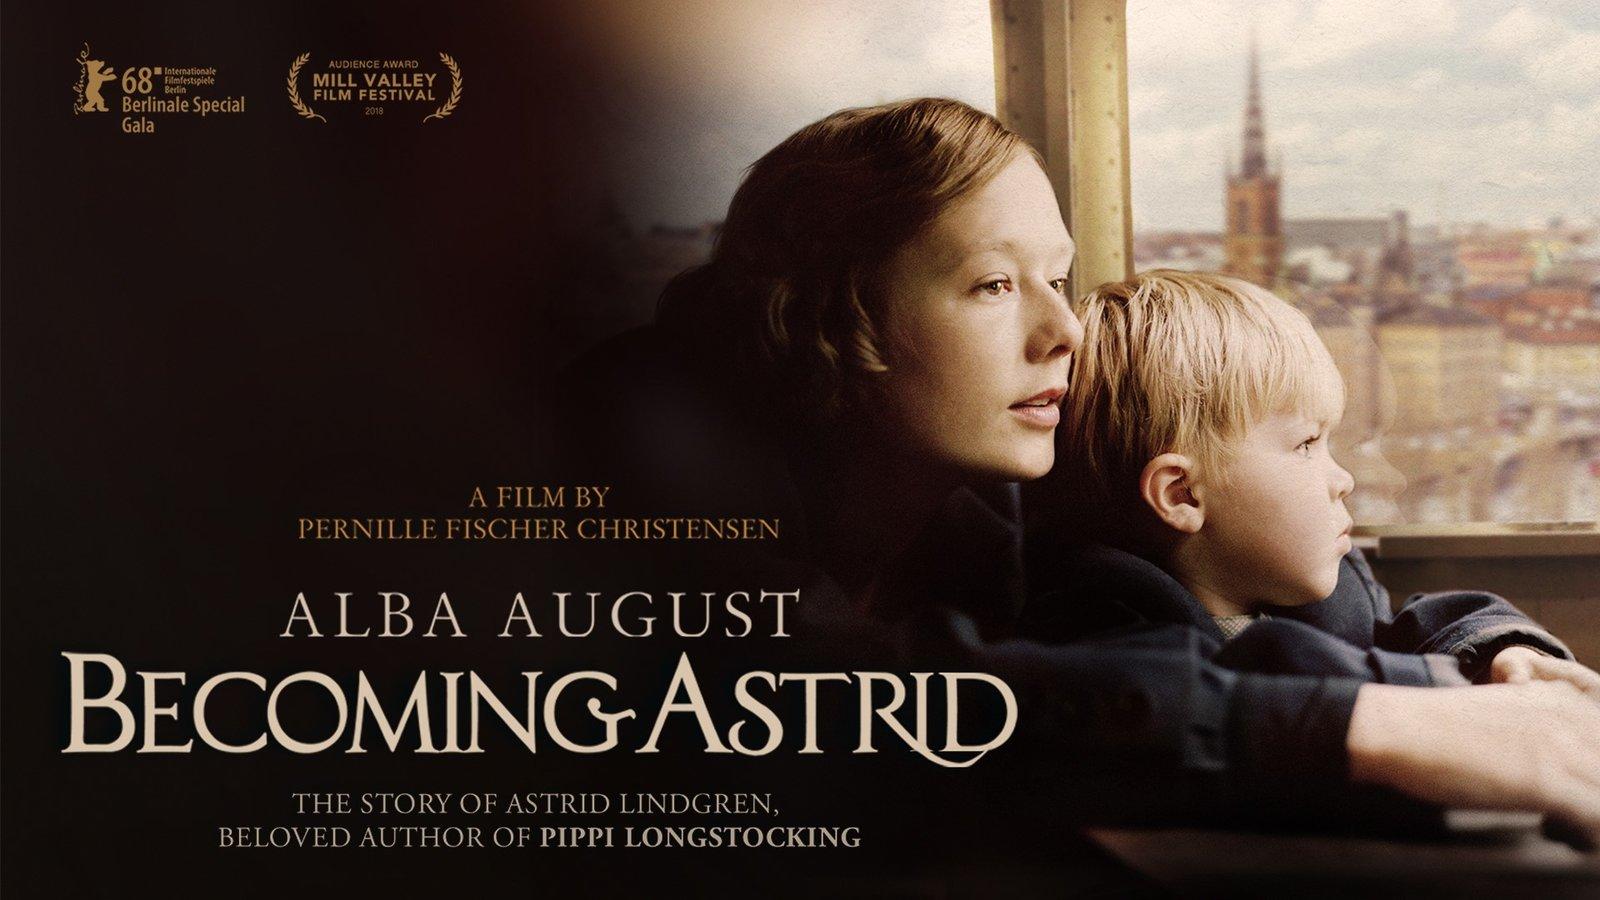 Becoming Astrid - Unga Astrid